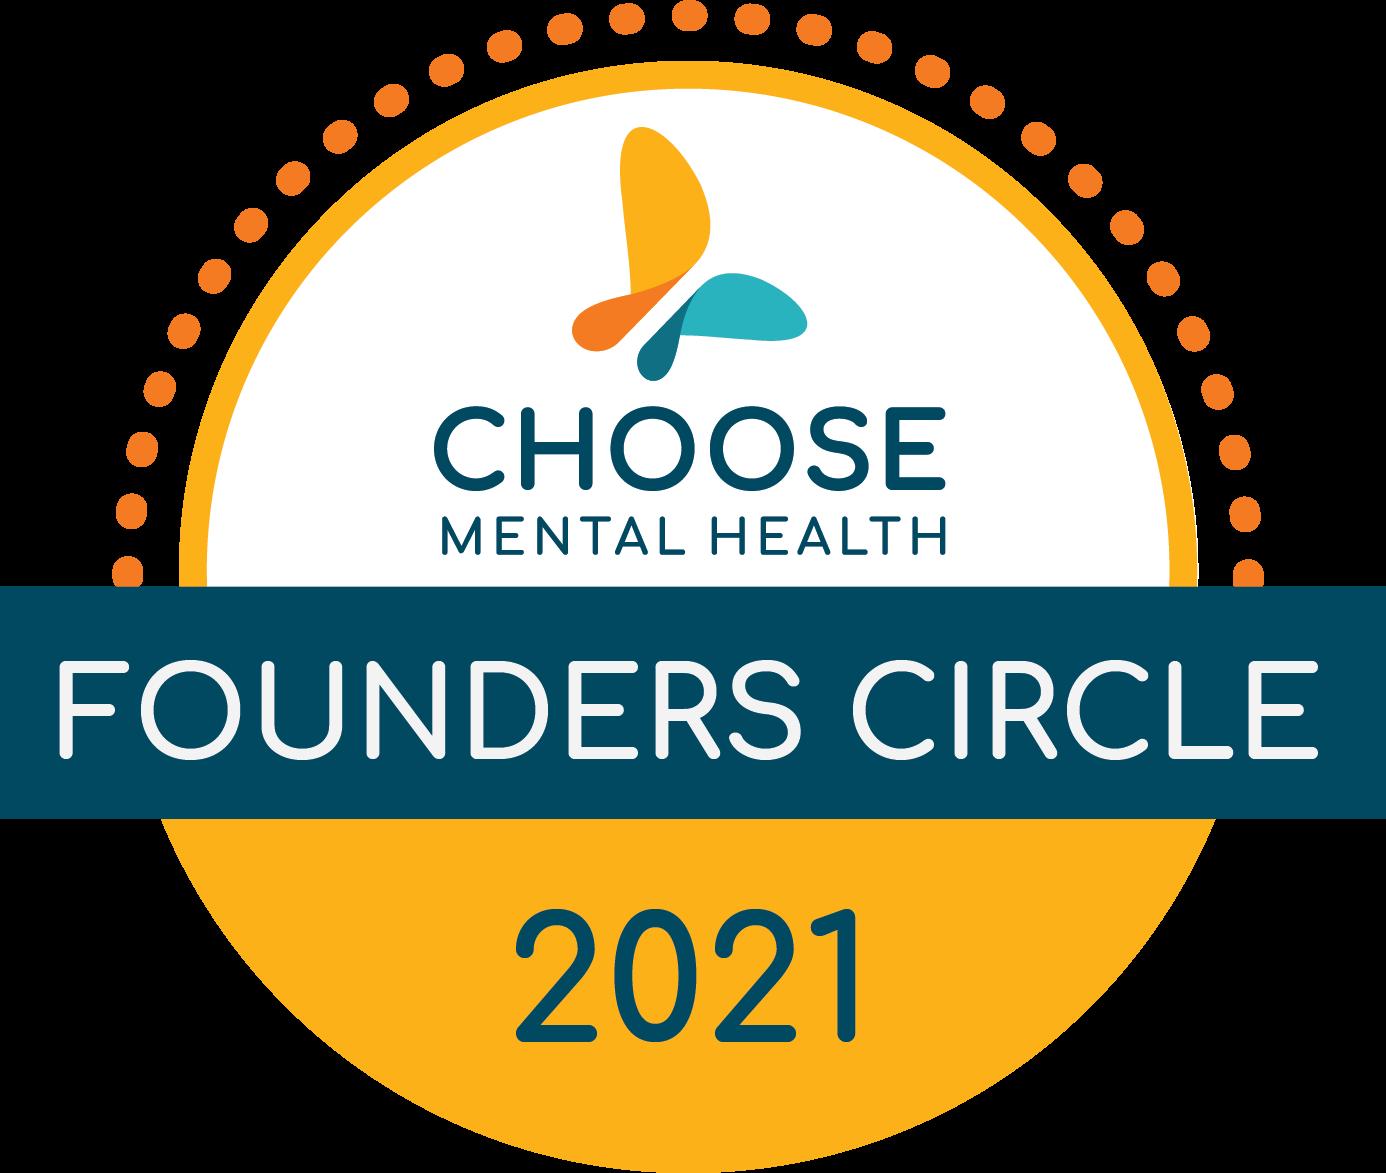 Choose Mental Health Founder's Circle Badge